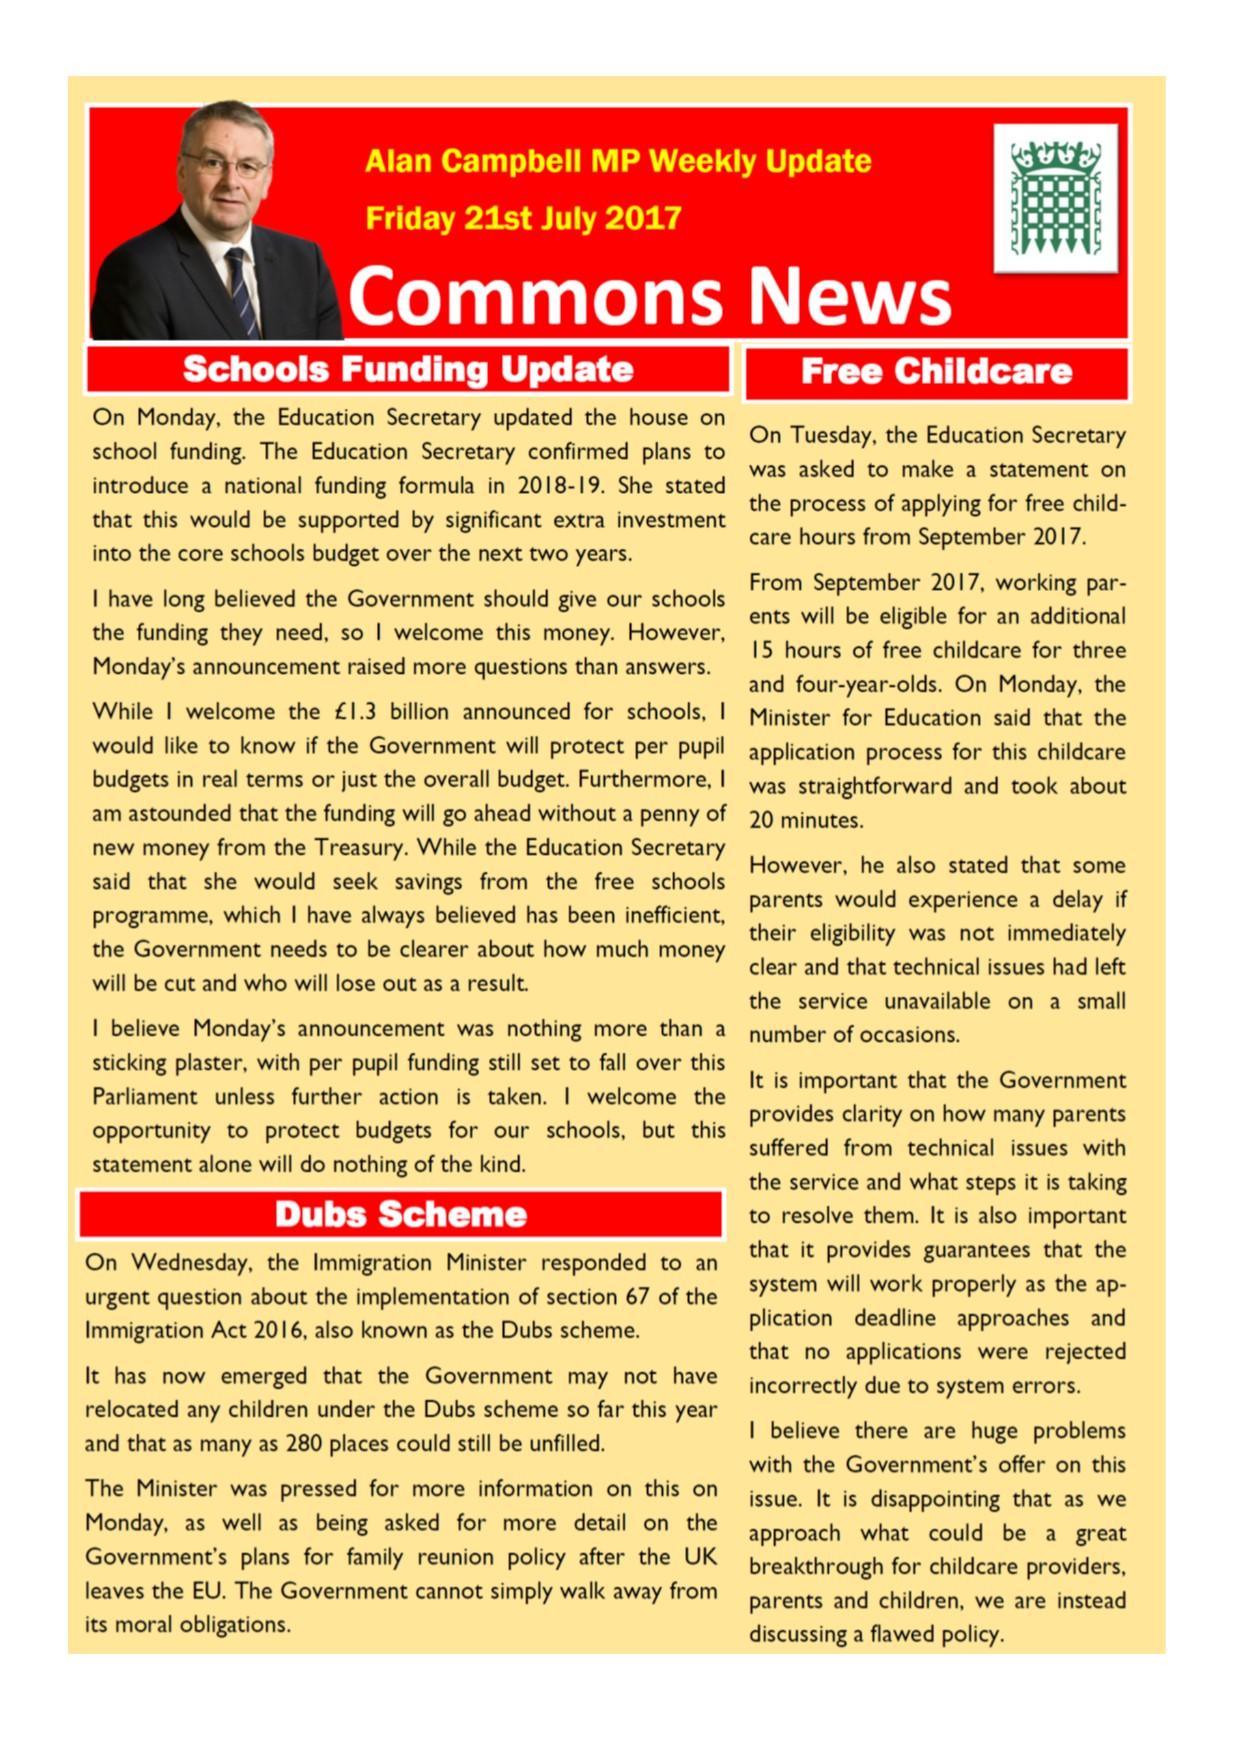 Commons_News_21st_July.jpg